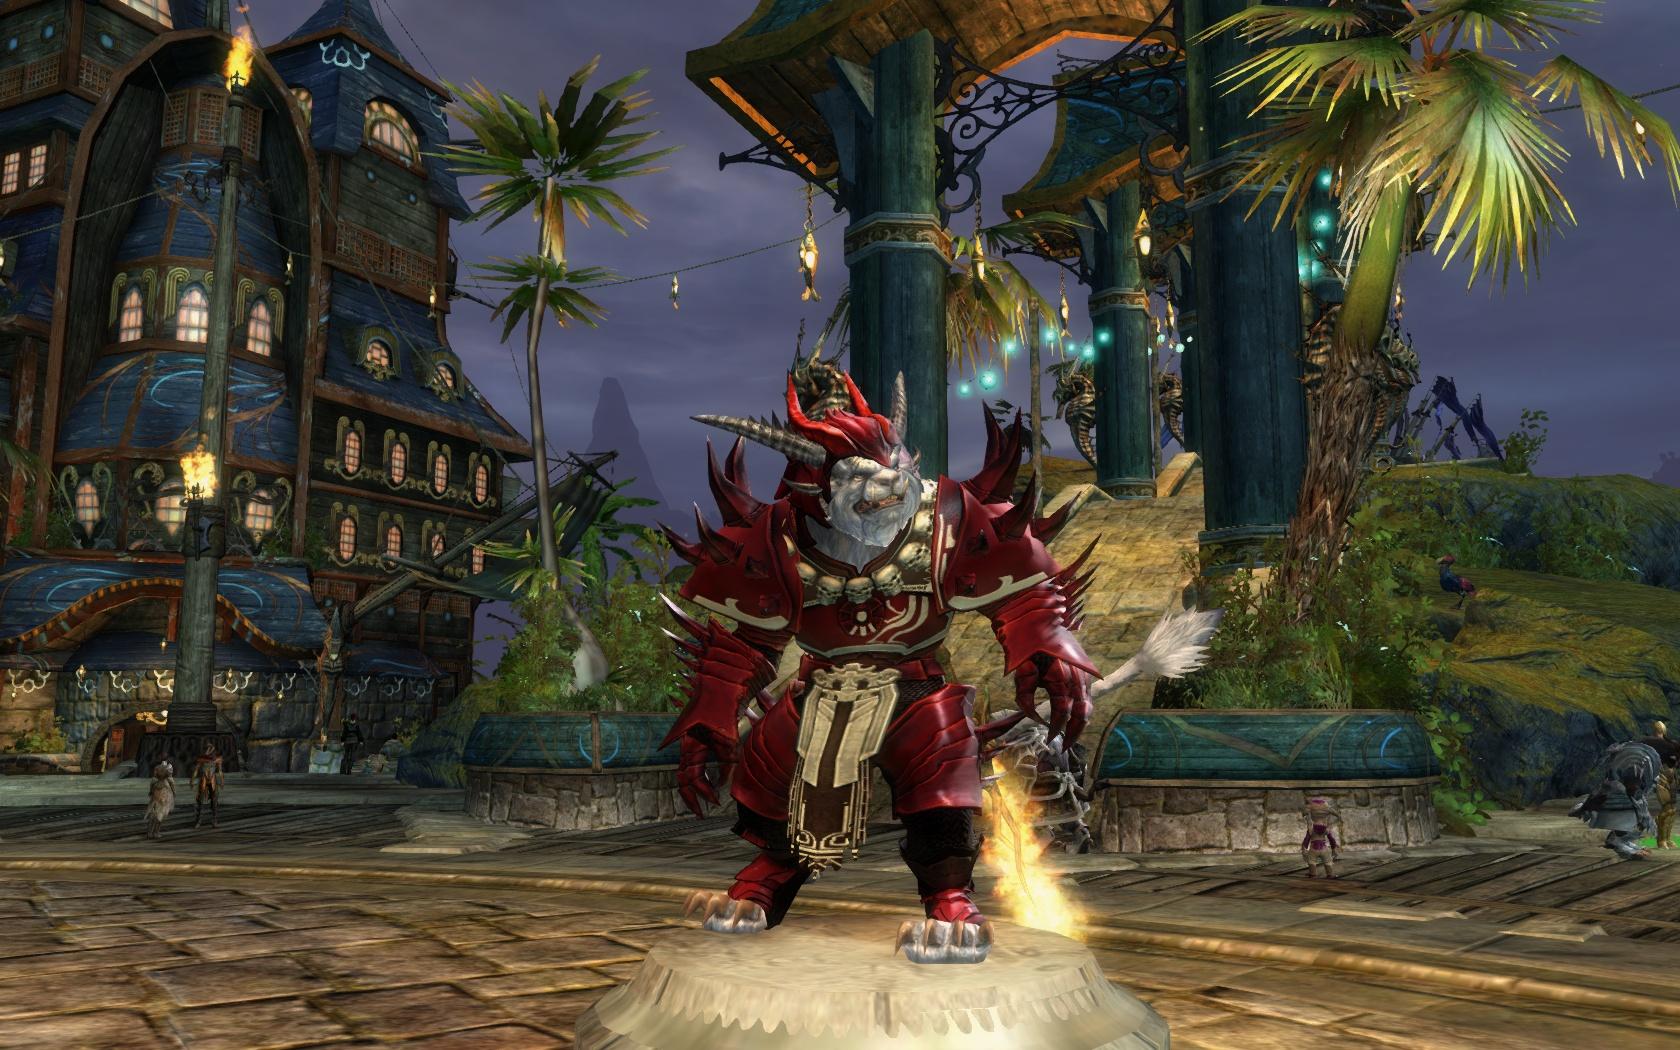 Guild wars 2 gw2 darkened desires gw2 fashion - I